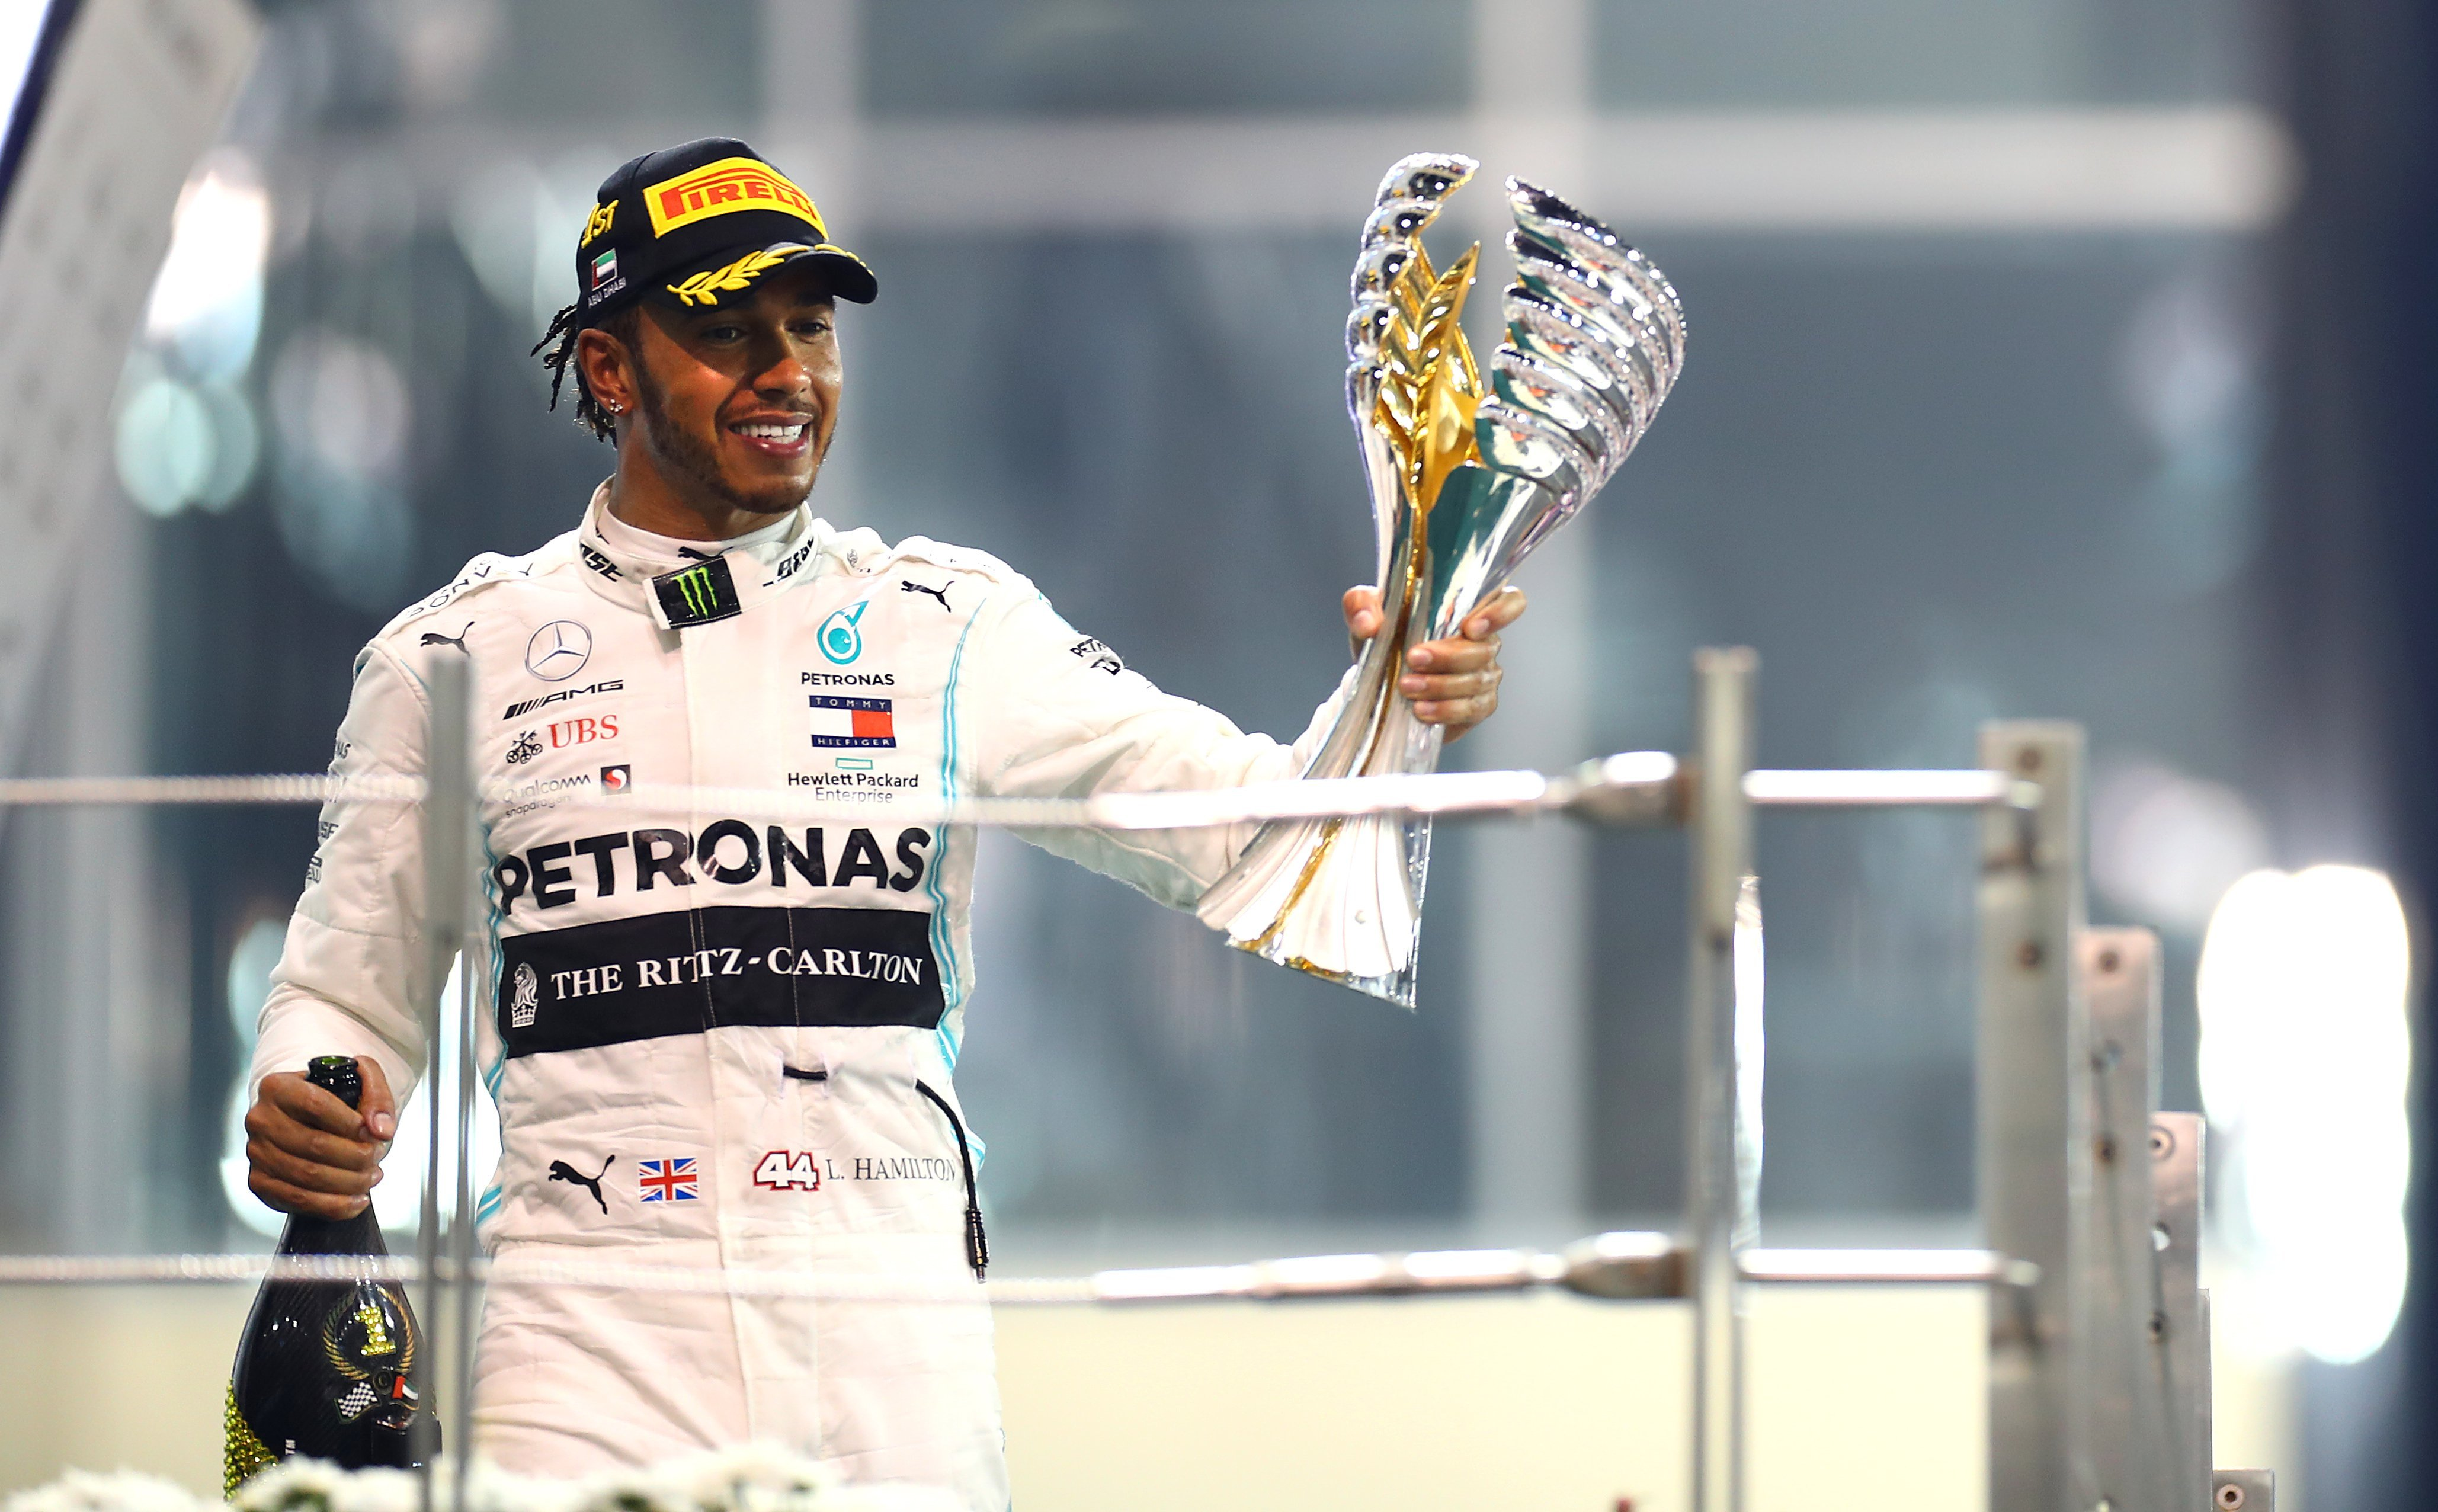 Lewis Hamilton wins Abu Dhabi GP as Formula 1 season comes to an end